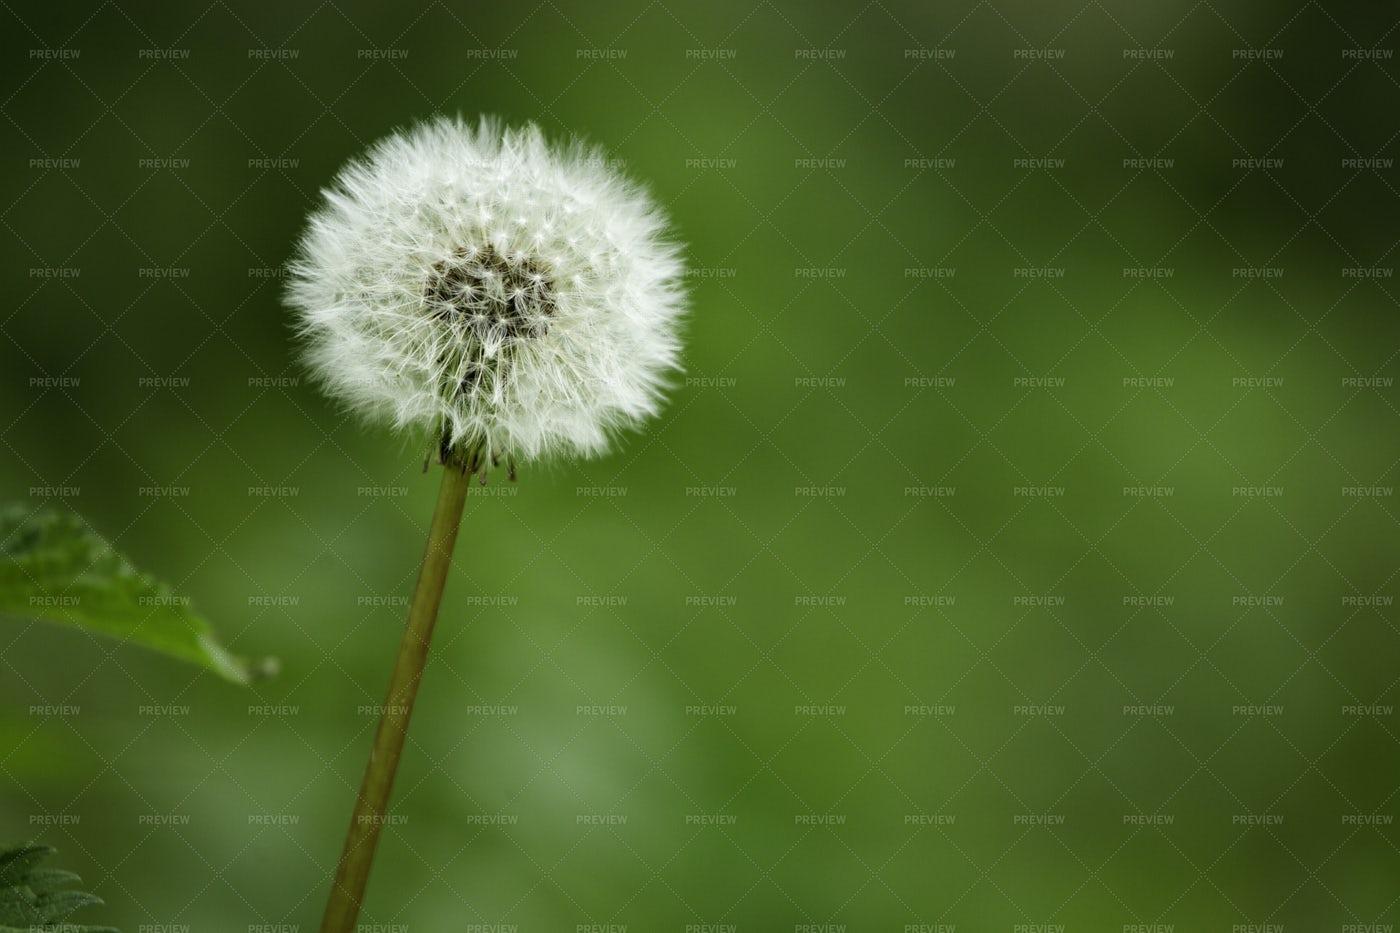 Dandelion On Green Background: Stock Photos